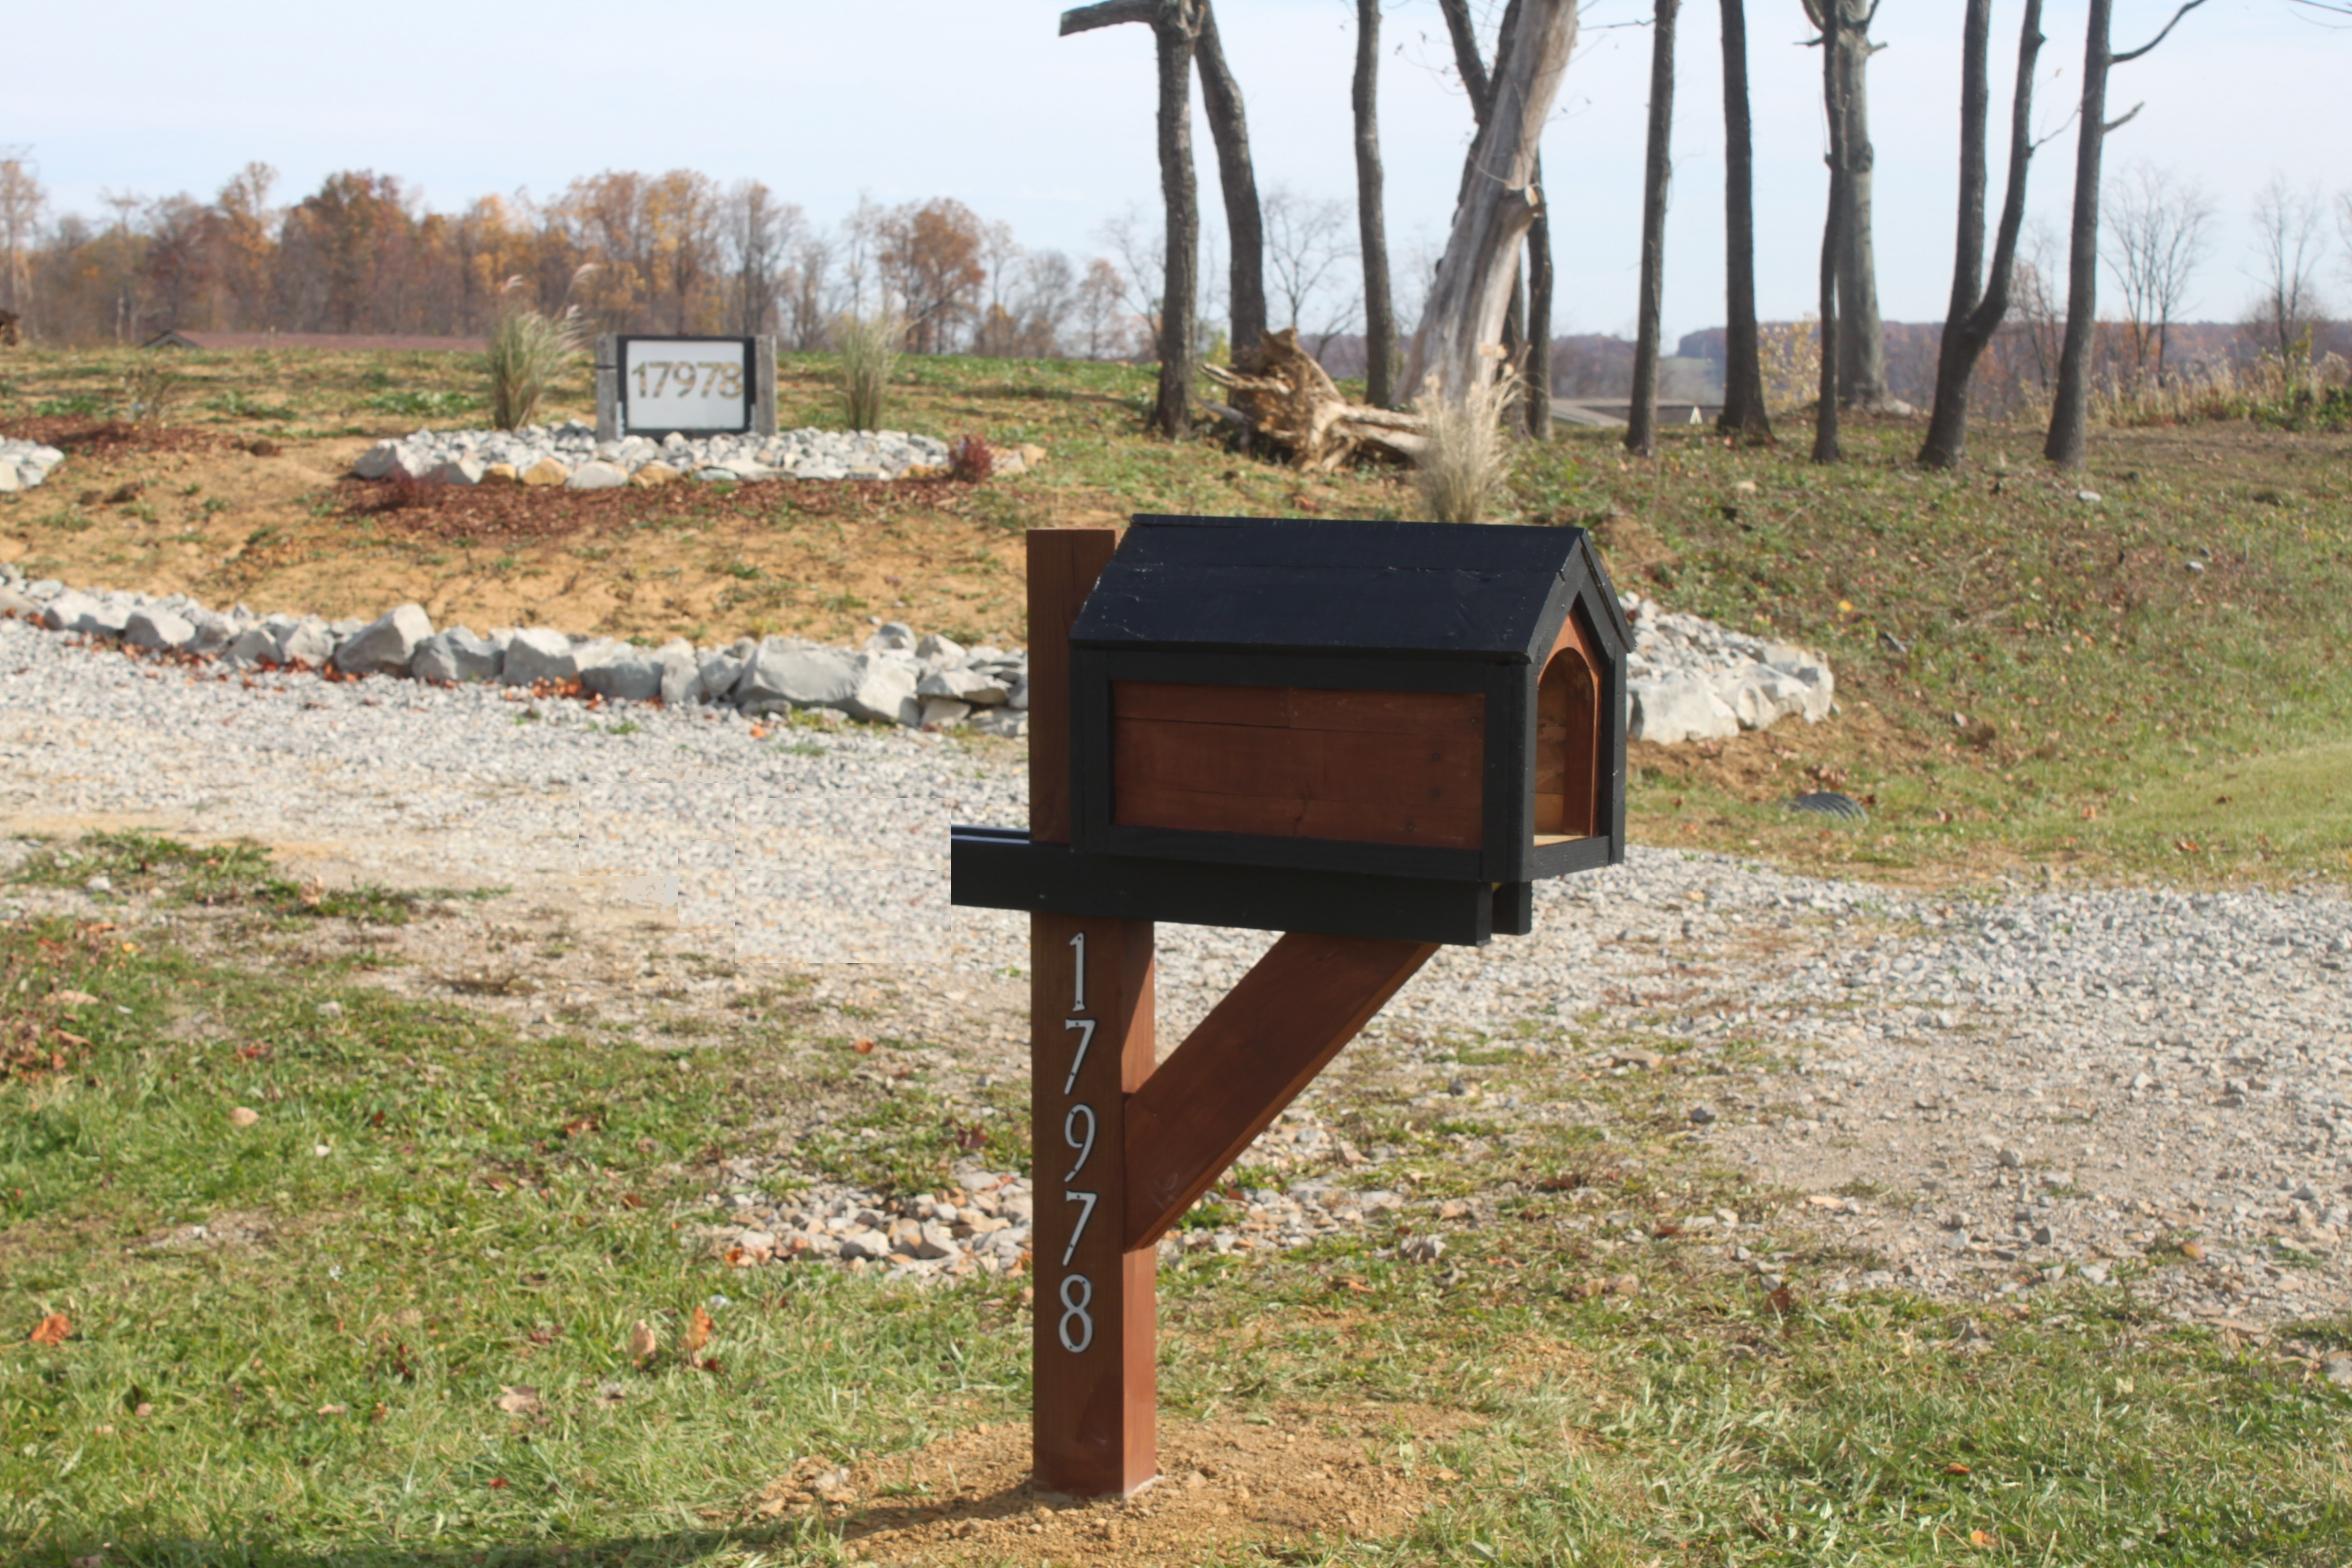 4x4 Mailbox Post Plans